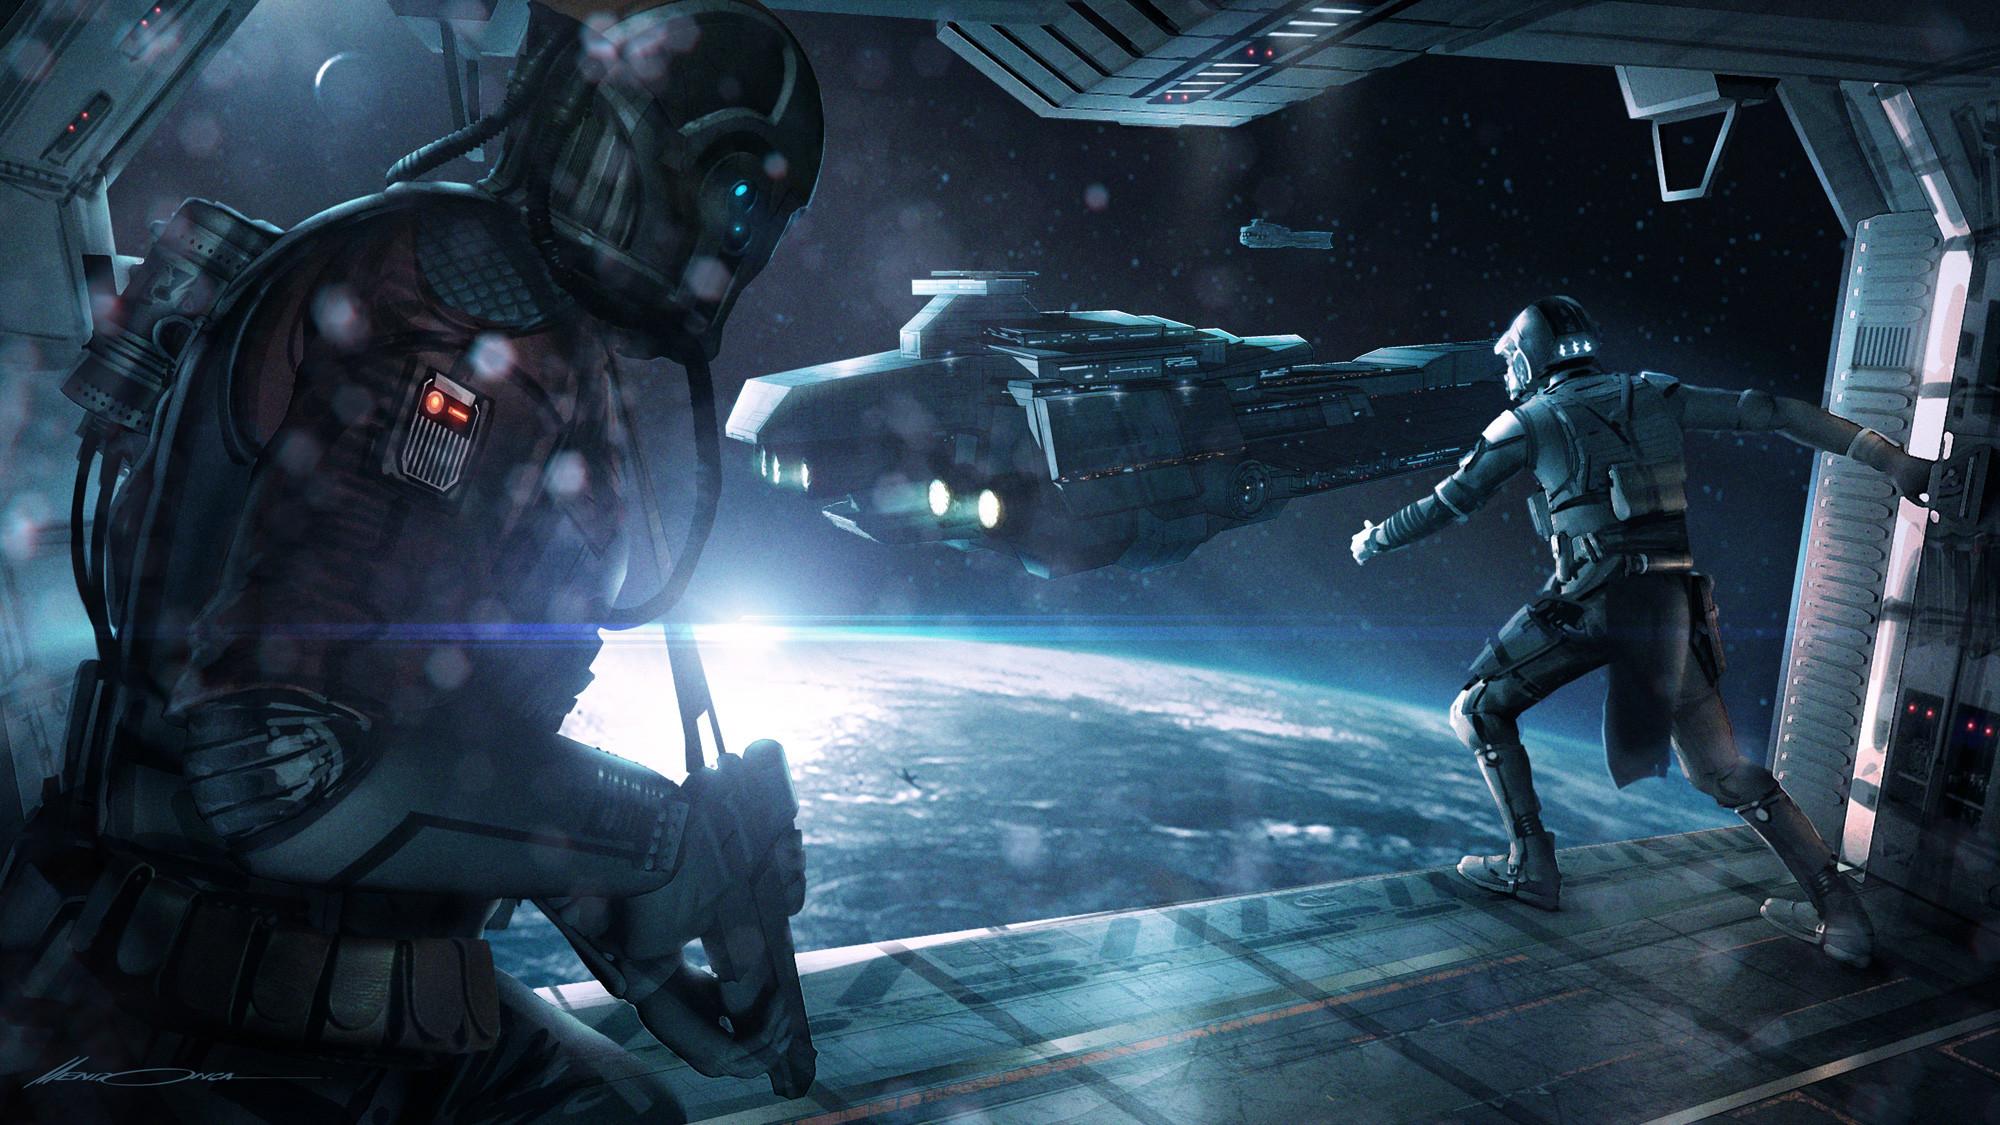 force awakens concept art – Google Search · Star Wars …